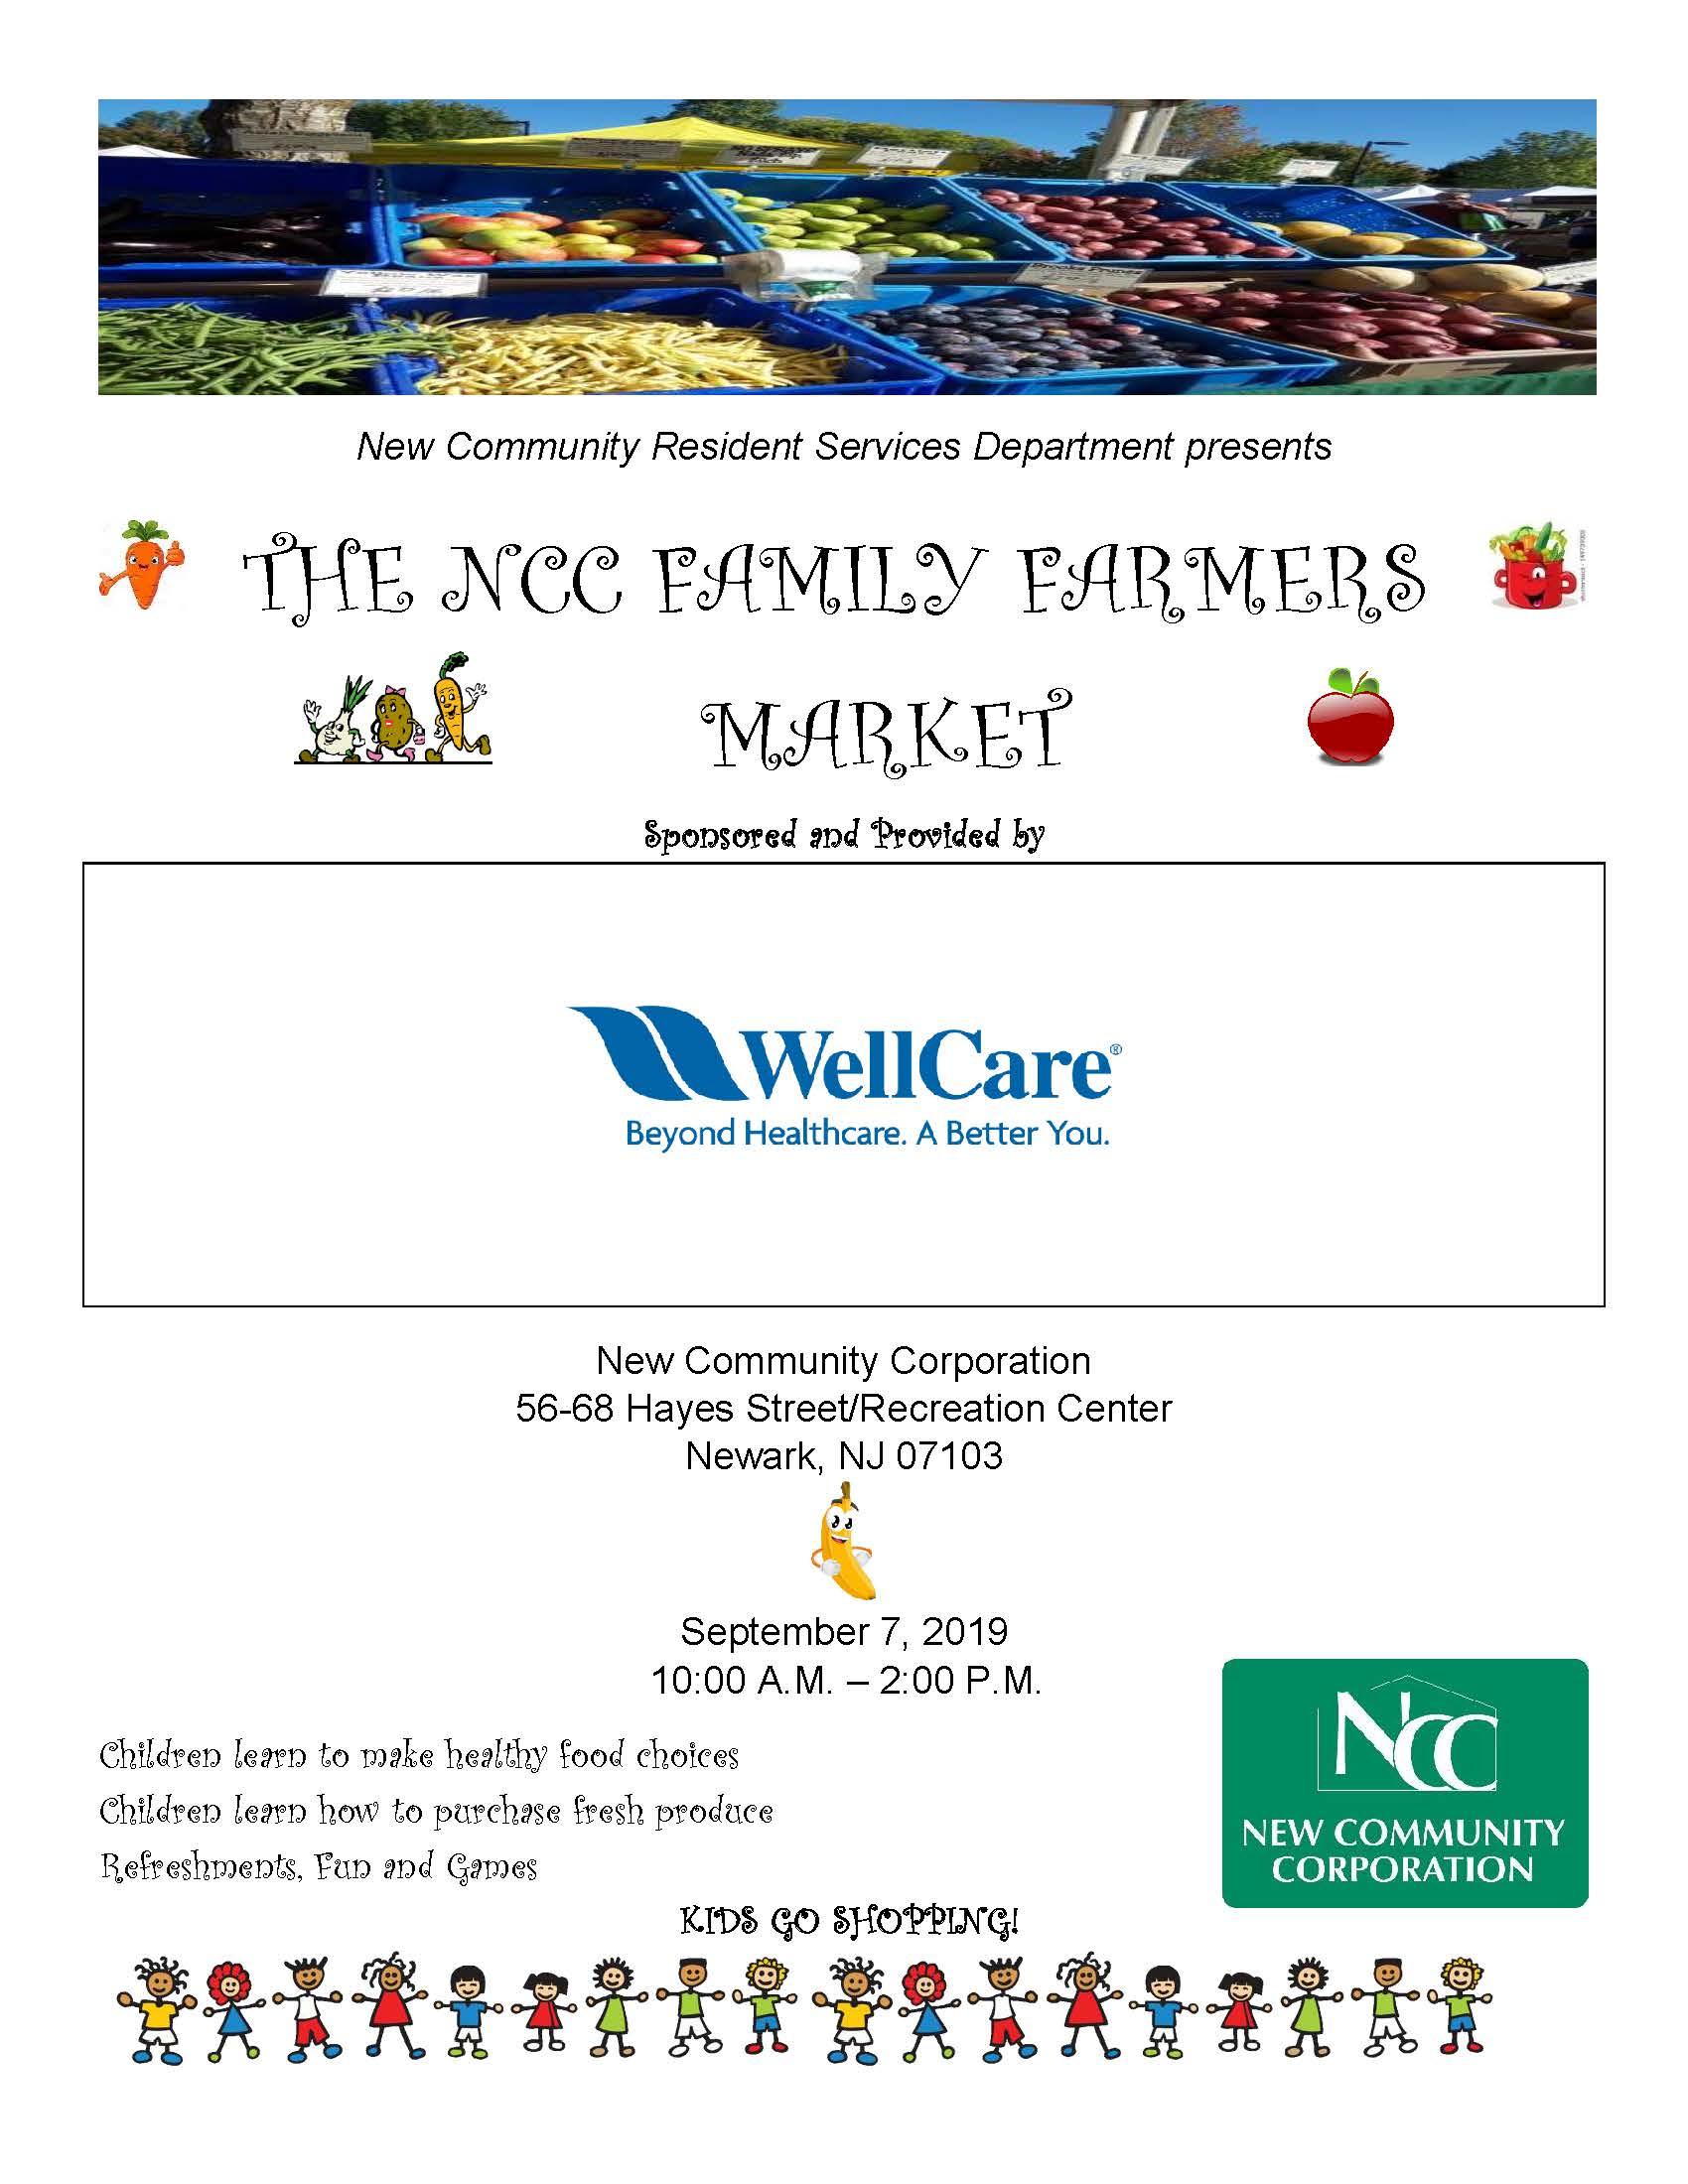 NCC Family Farmers Market Set for Sept. 7